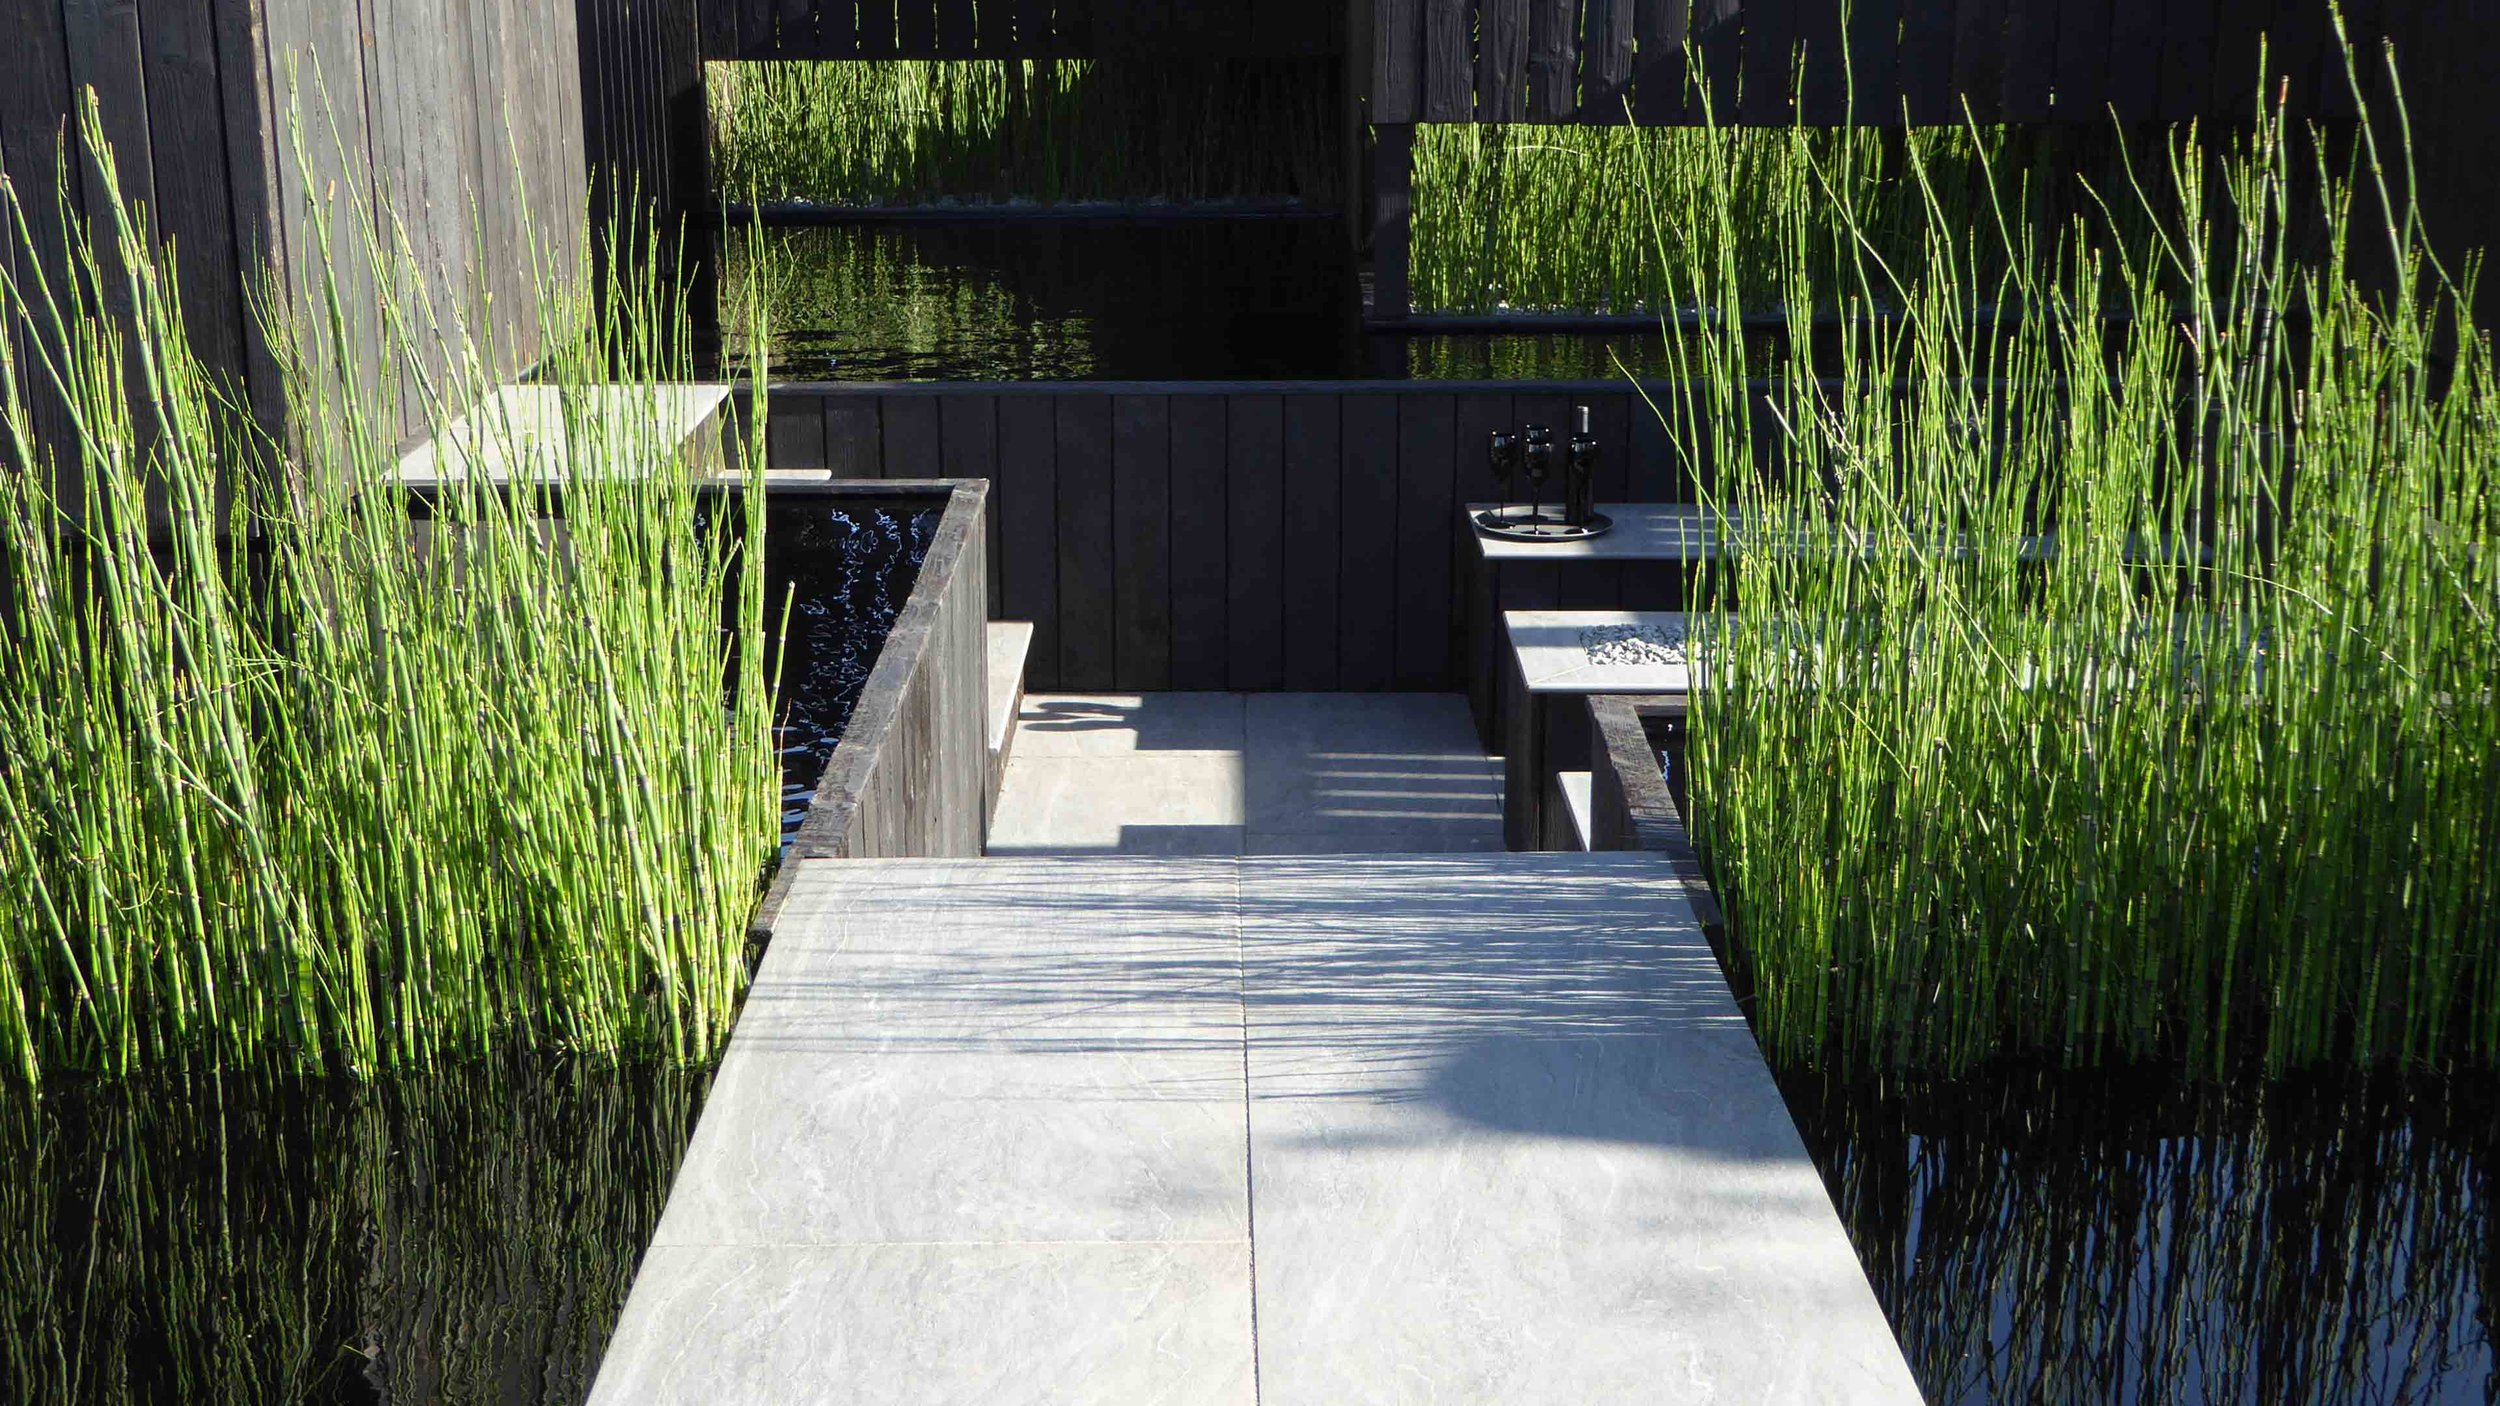 Southport Garden Design: Kuro: Porcelain Path And Sunken Seating Area